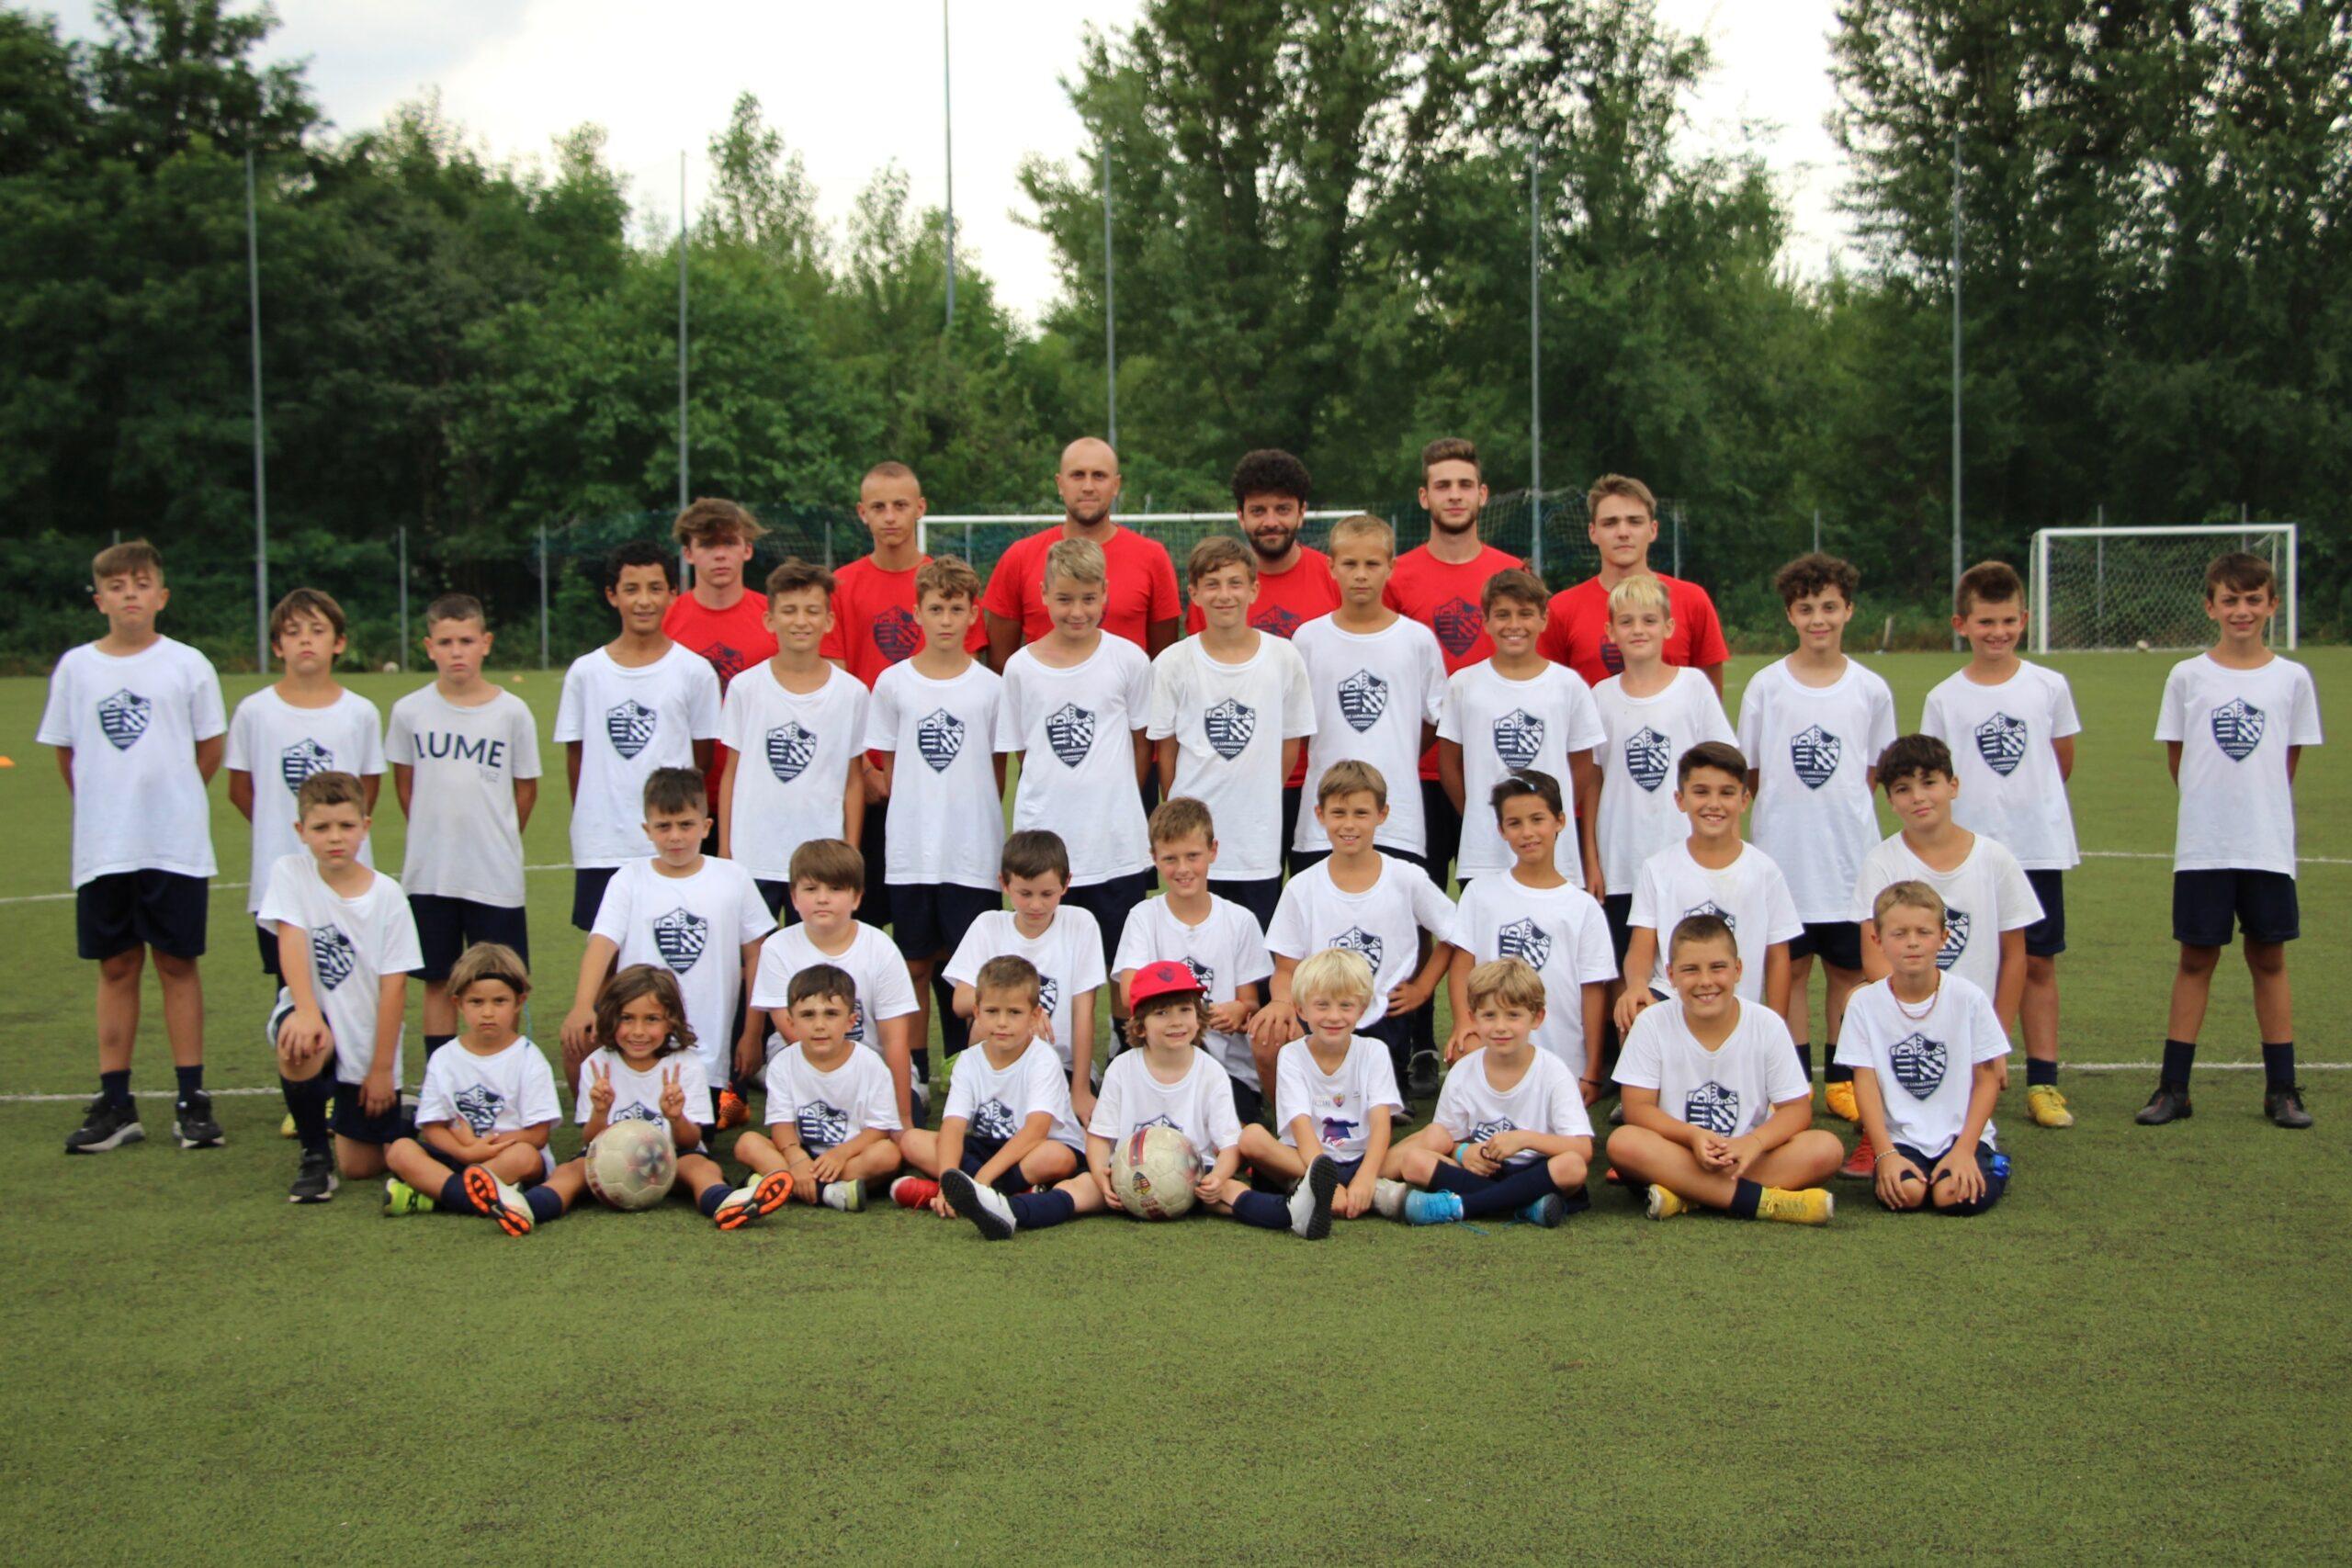 Lume Summer Camp | 3ª Settimana